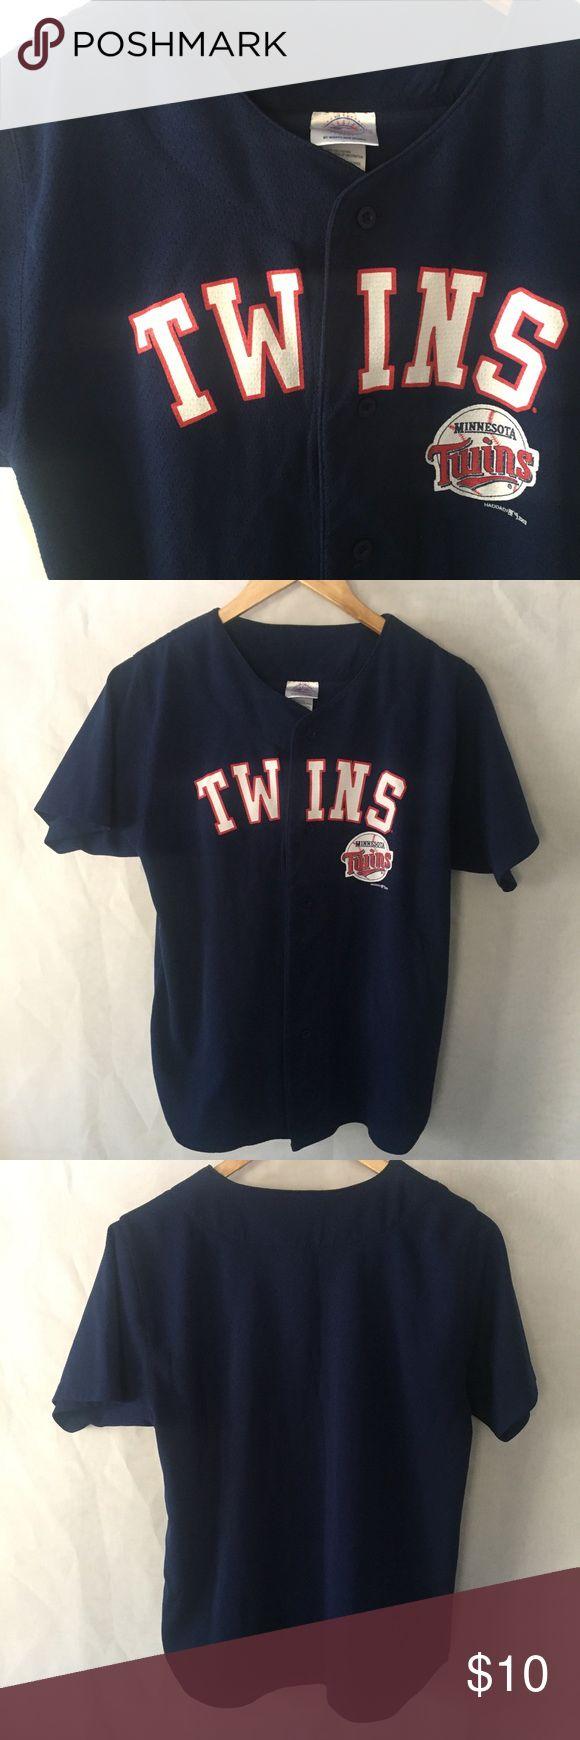 Boys MLB Twins Shirt Boys Minnesota Twins MLB shirt, EUC Shirts & Tops Tees - Short Sleeve